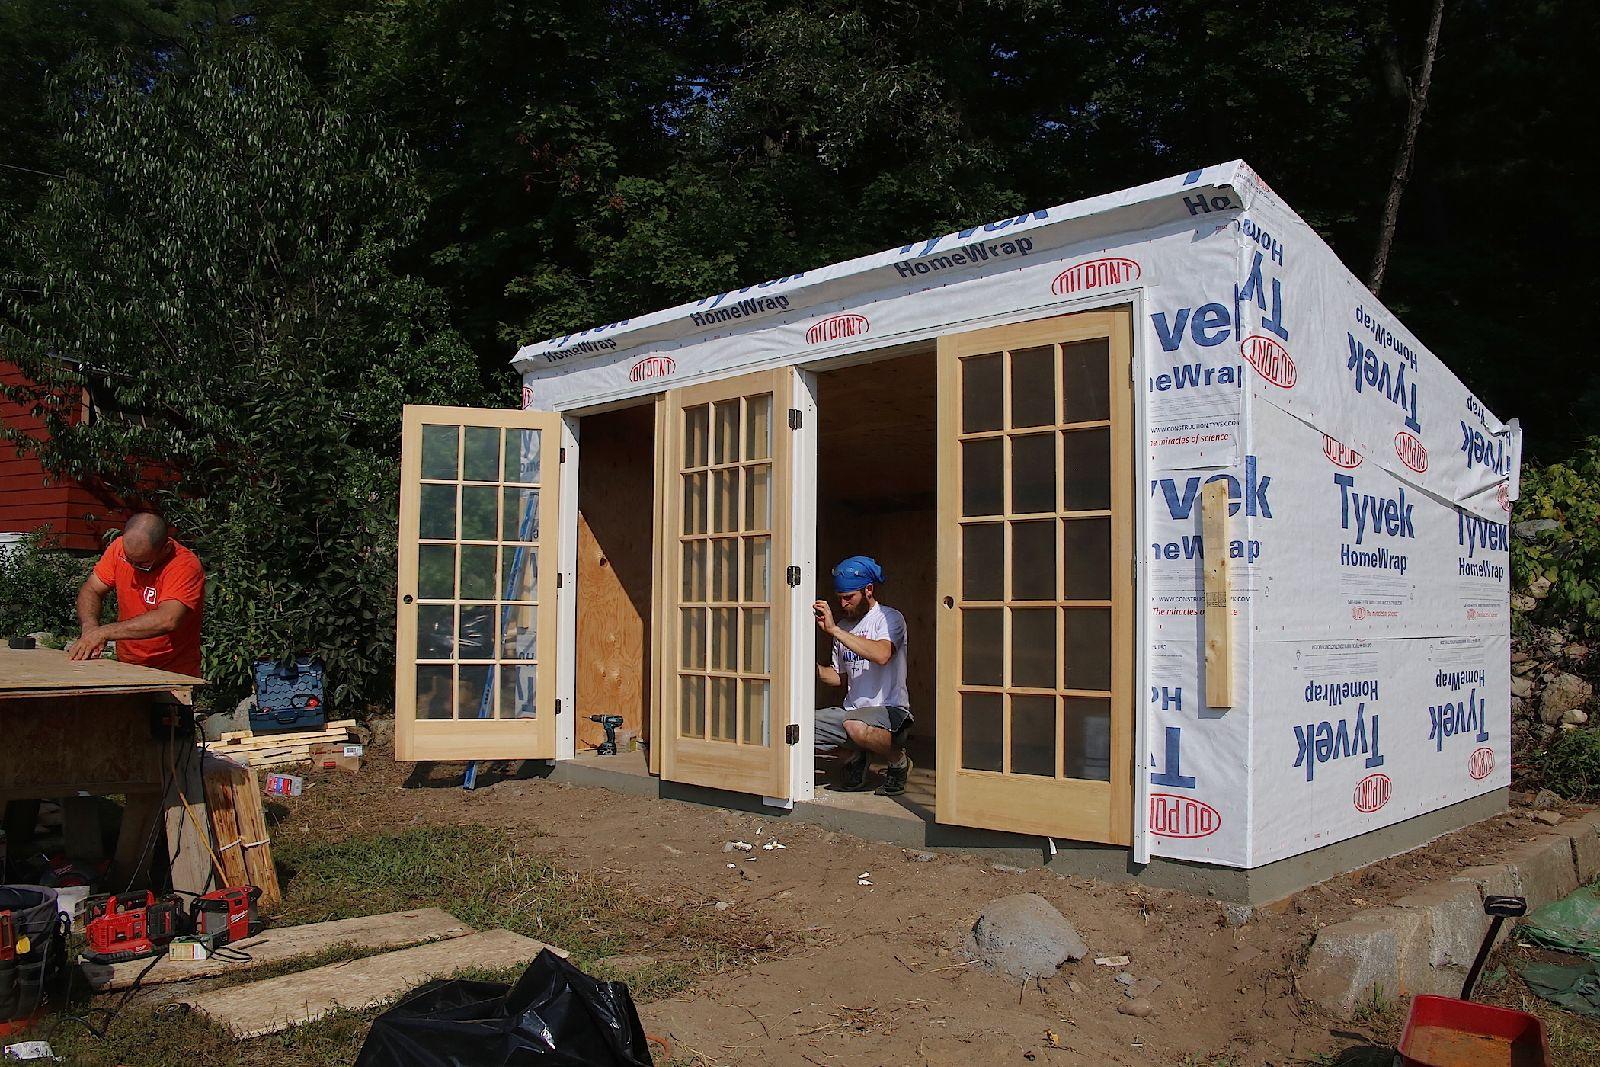 Building_shed_10_15.JPG